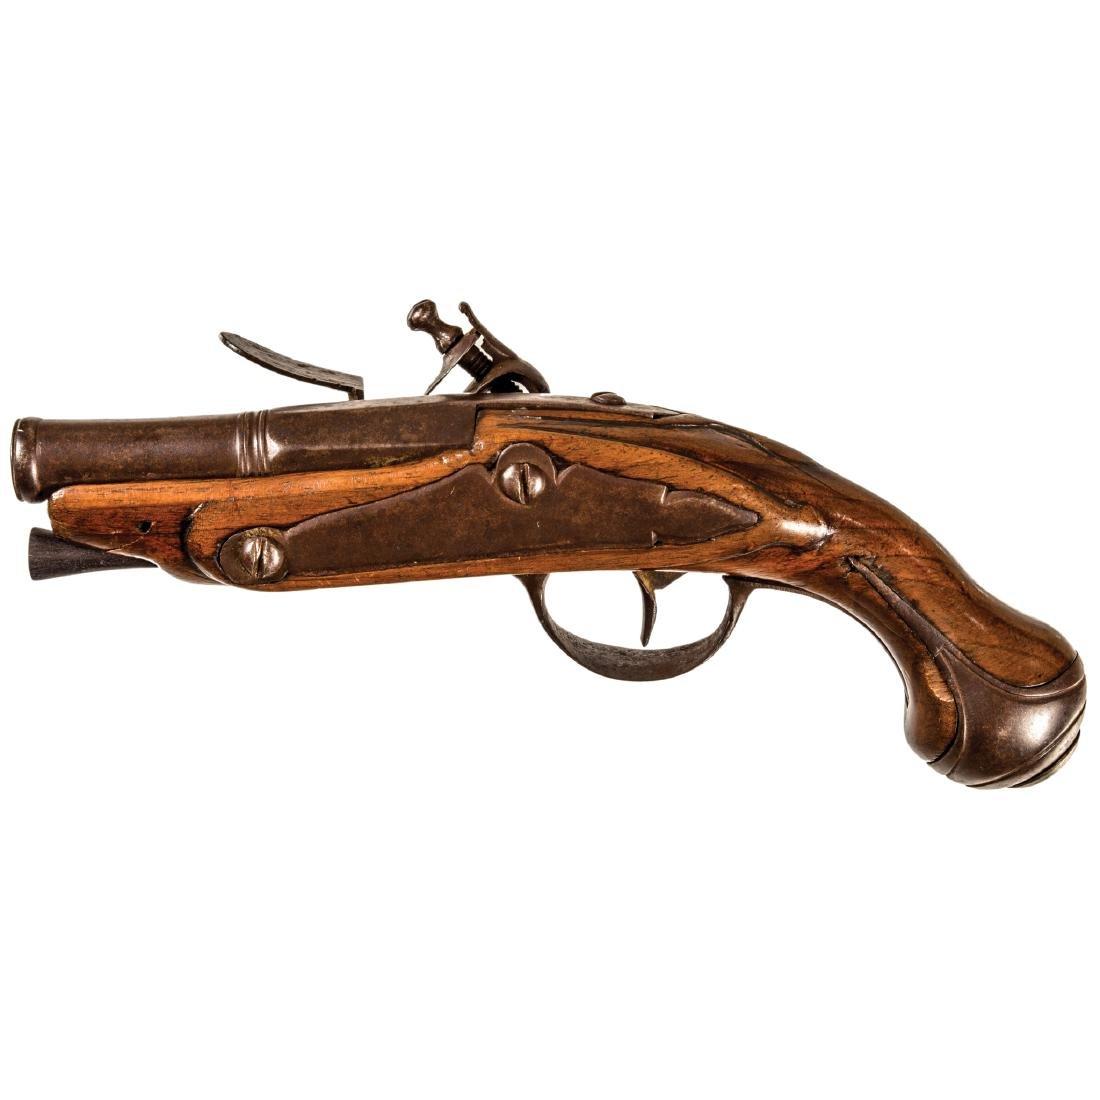 c 1760-80 LE PAGE French Pocket Flintlock Pistol - 2